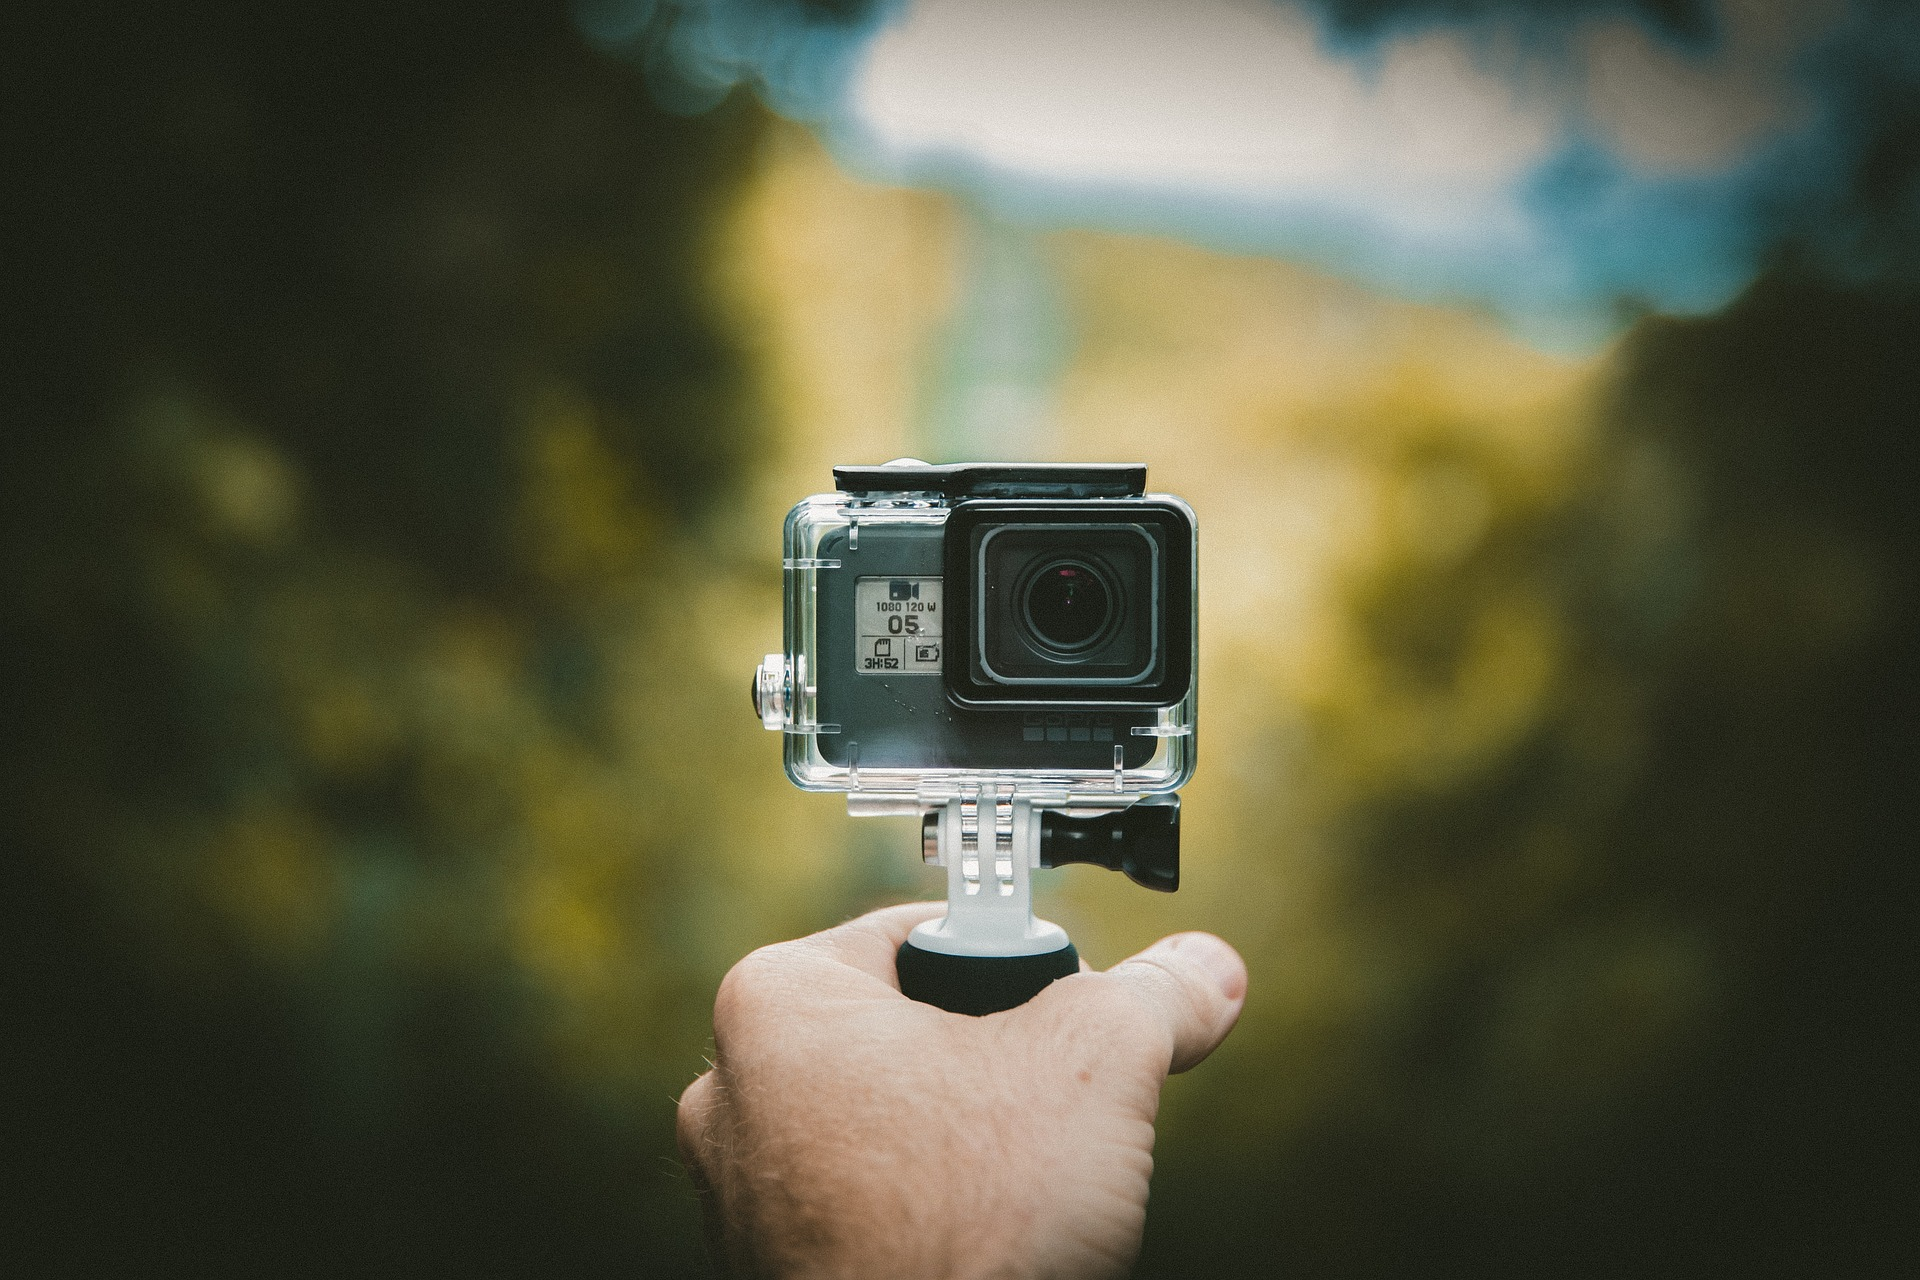 Camera_miniature_CC0.jpg?1544181935